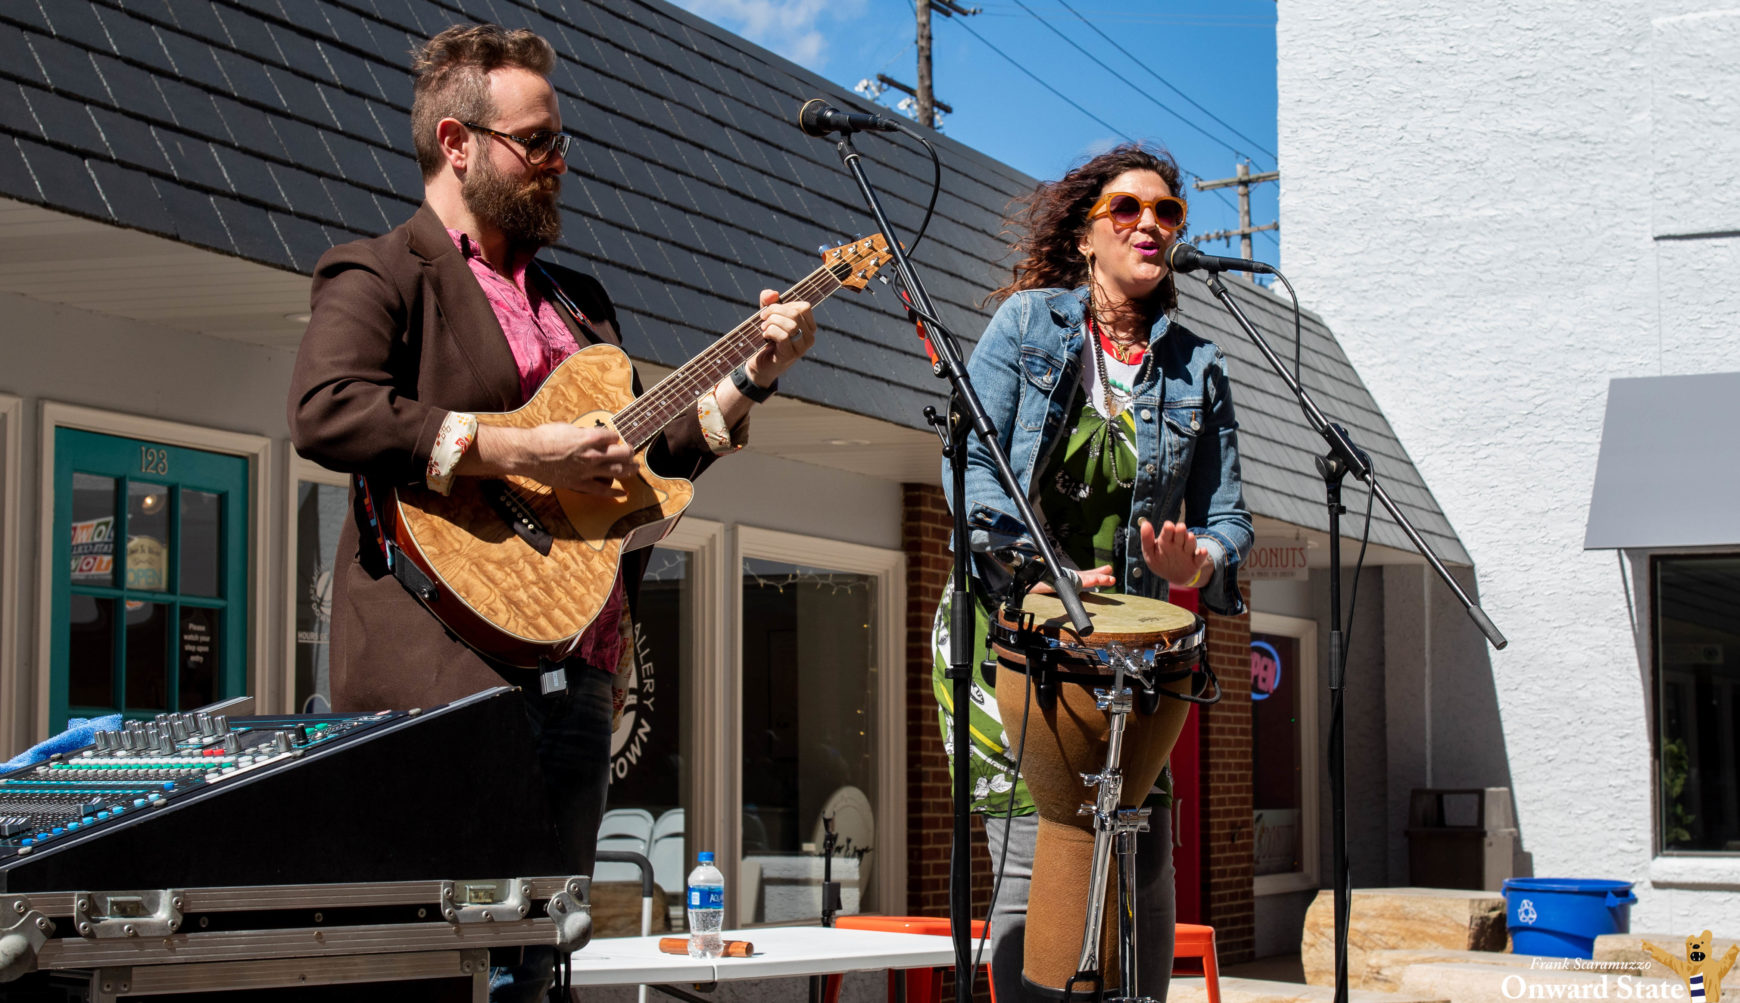 Pop Up Ave Returns For Annual Fall Urban Flea Market